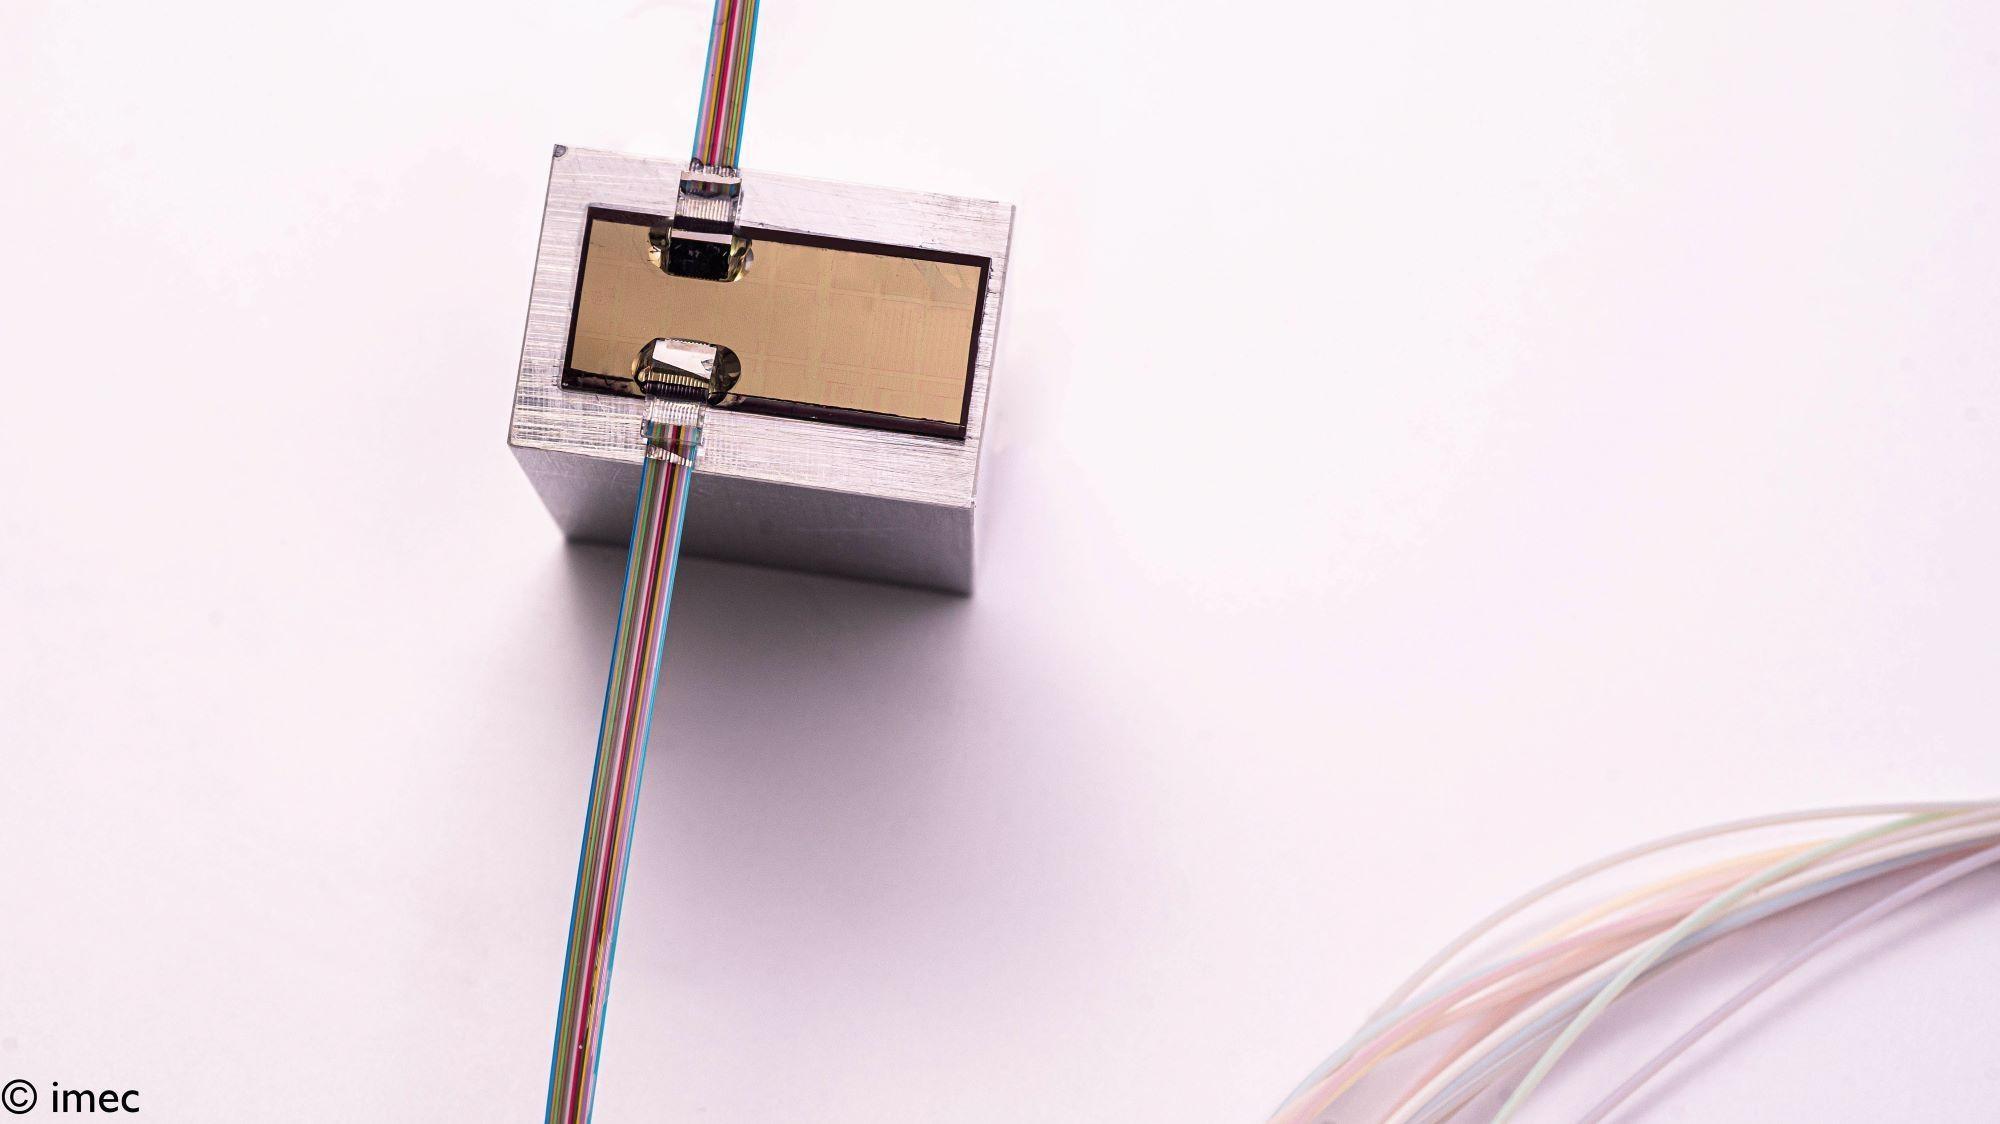 Imec Demonstrates an Ultra-Sensitive, Small Optomechanical Ultrasound Sensor in Silicon Photonics